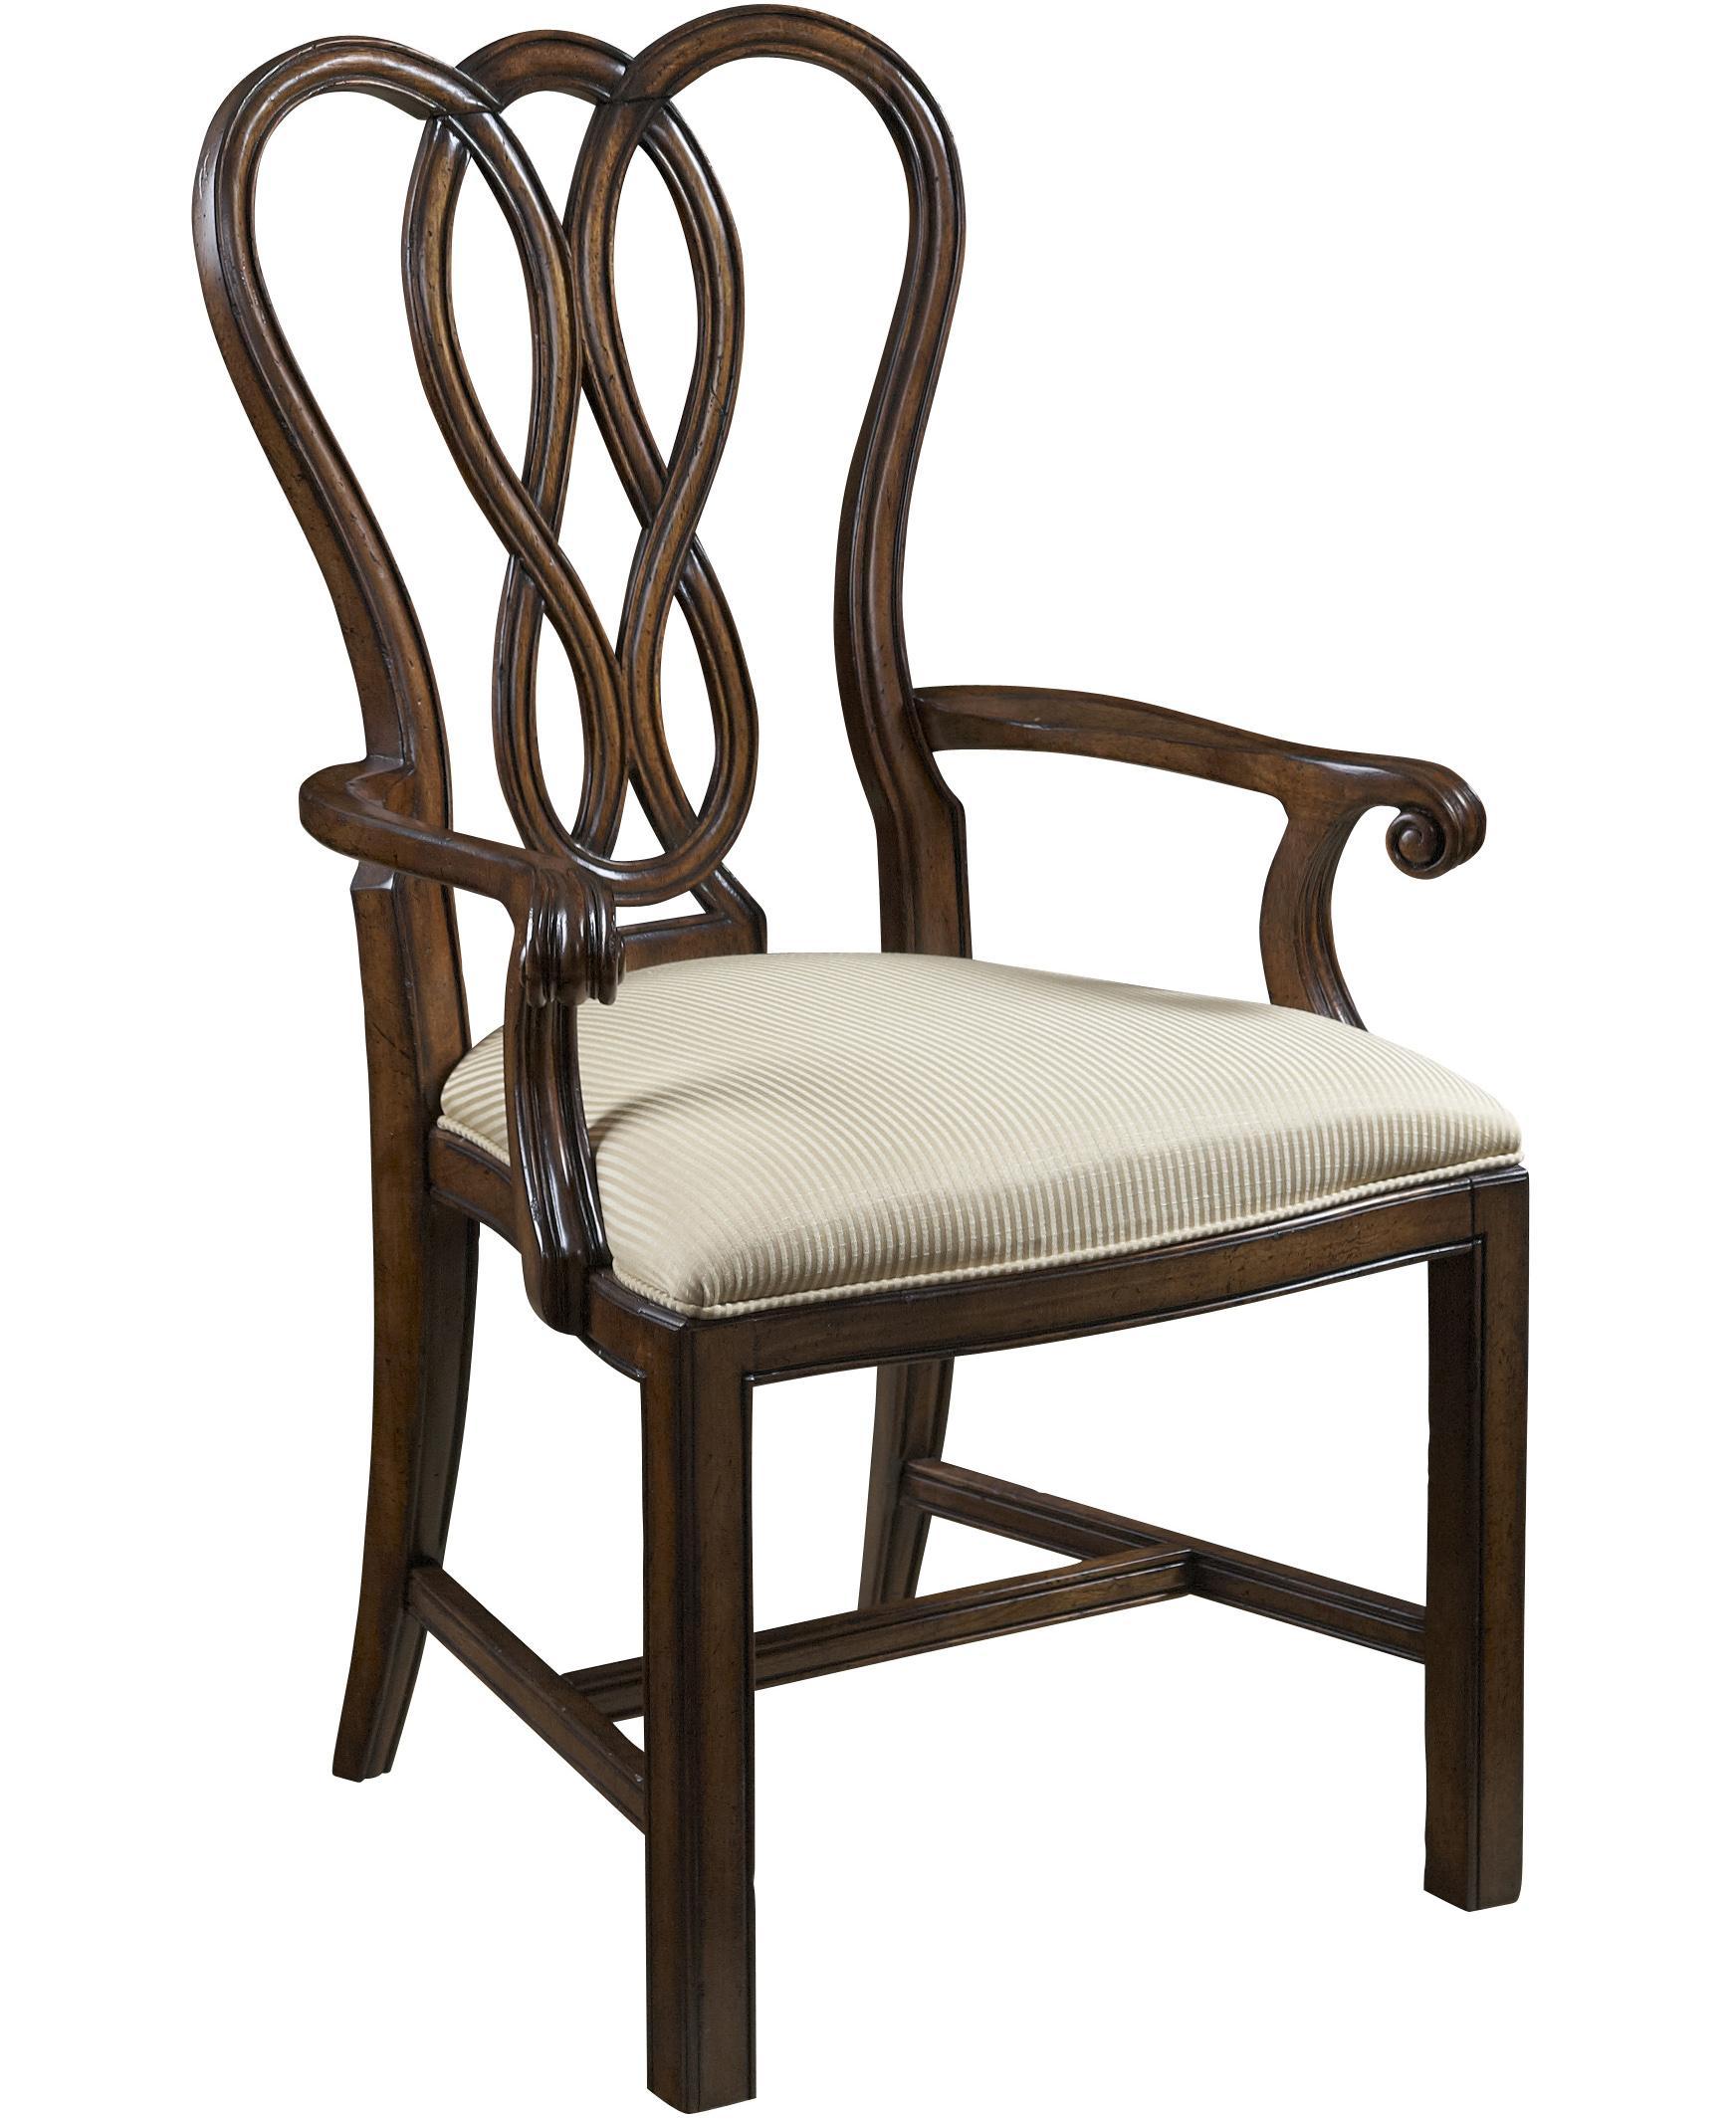 Belfort Signature Vienna Arm Chair - Item Number: 1110-821F